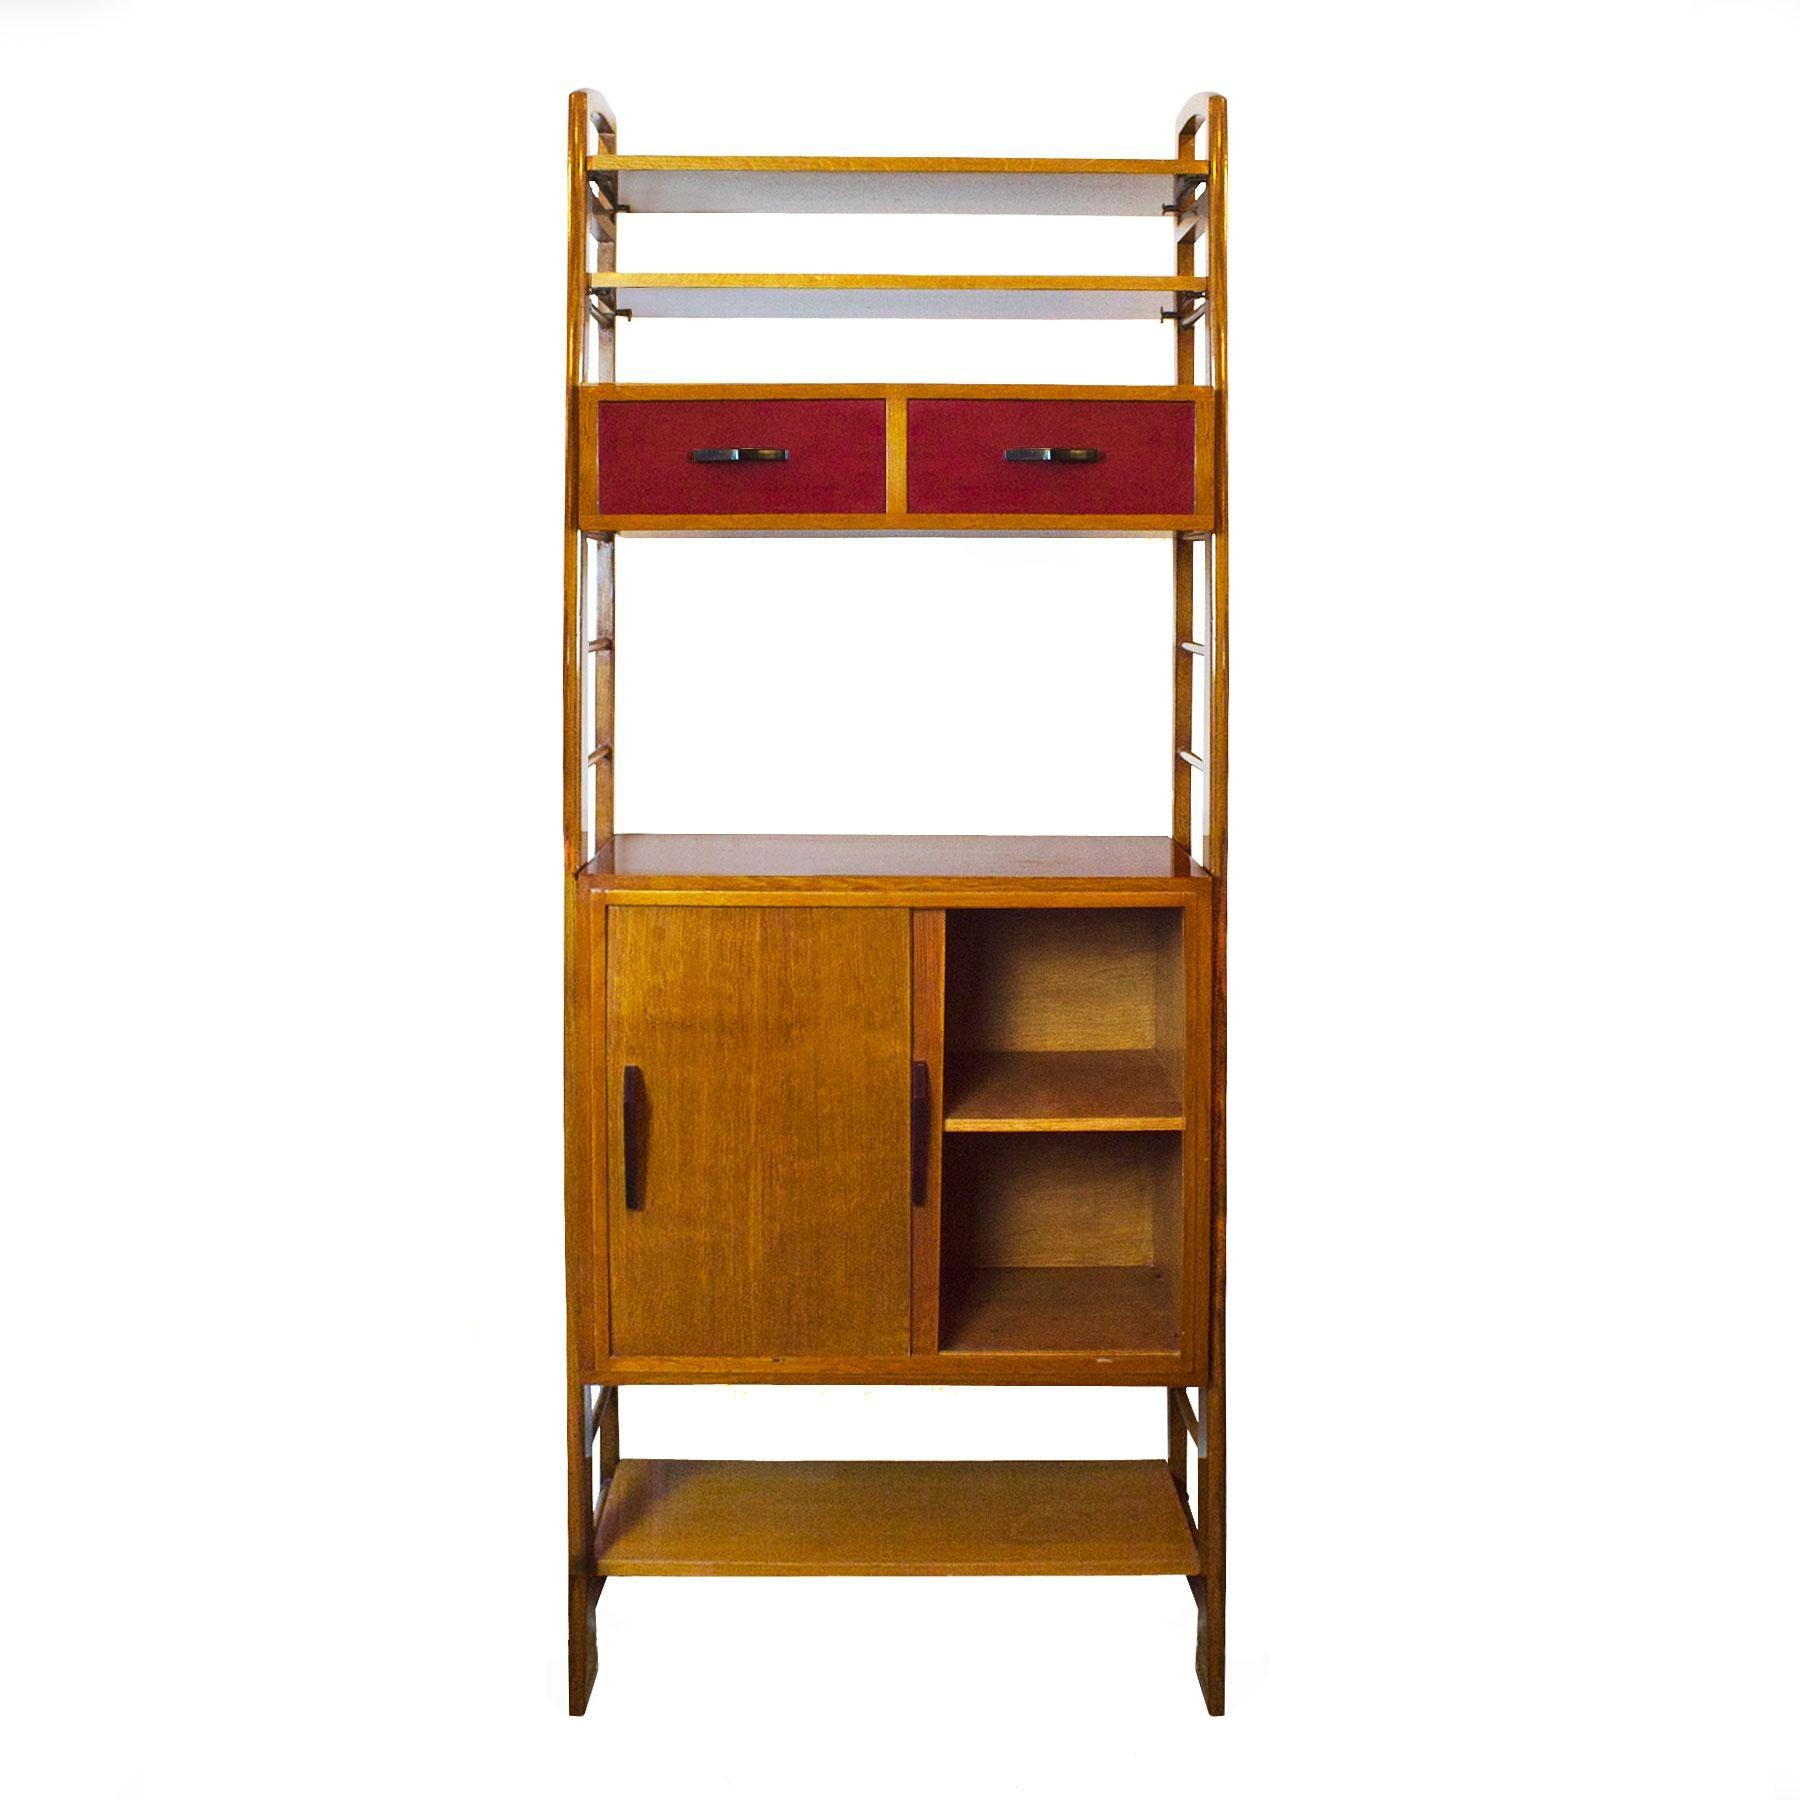 1950s Oak Modulus Storage Cabinet Sliding Doors And Shelves